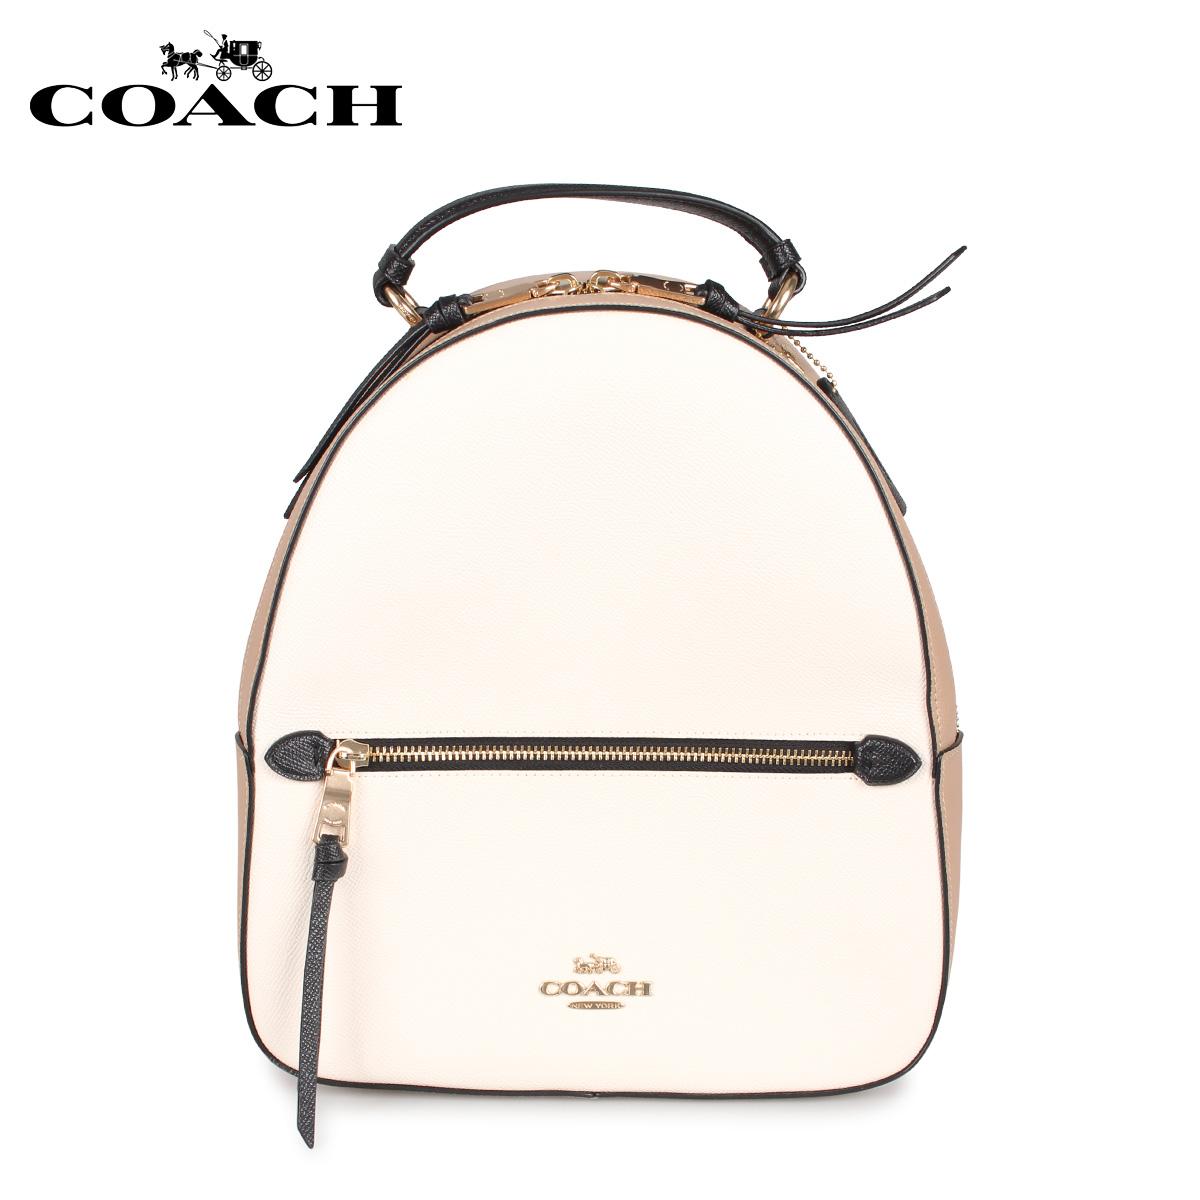 COACH コーチ バッグ リュック バックパック レディース オフホワイト 166 [3/18 新入荷]